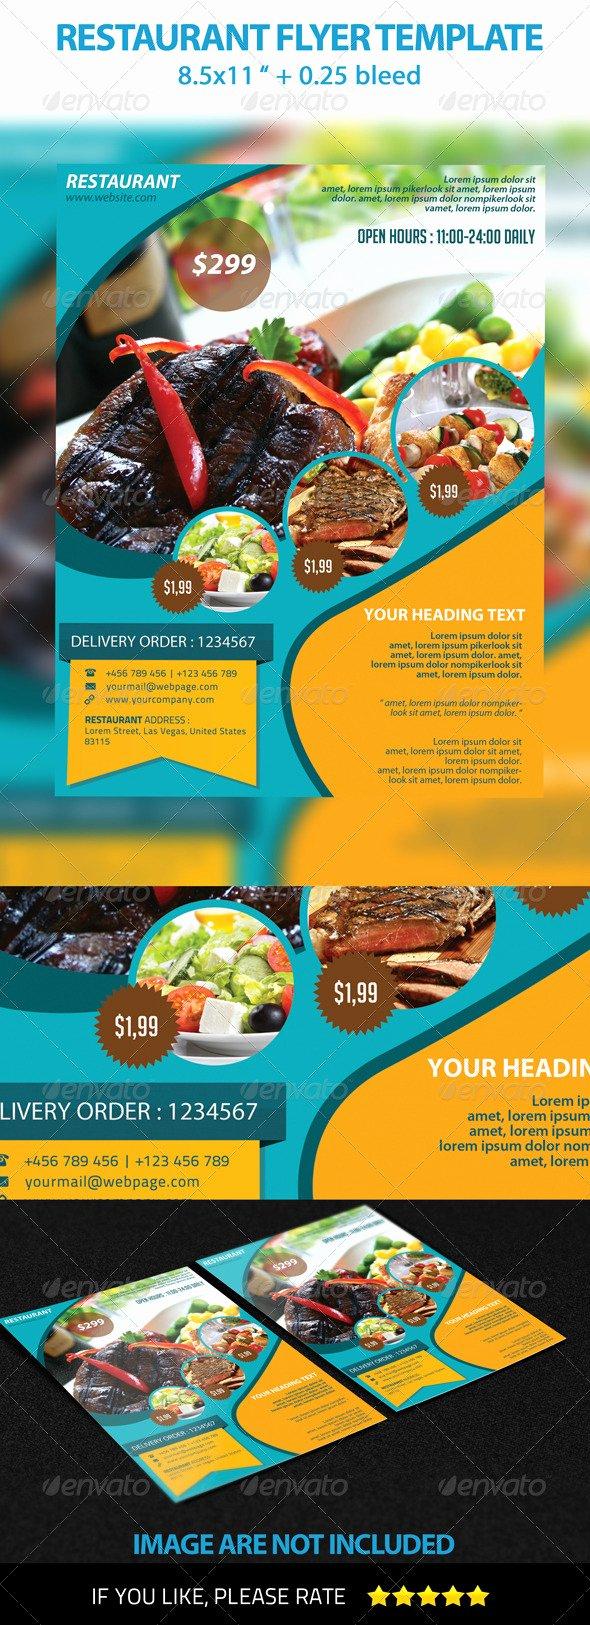 Restaurant Flyer Template Free Best Of Restaurant Flyer Template